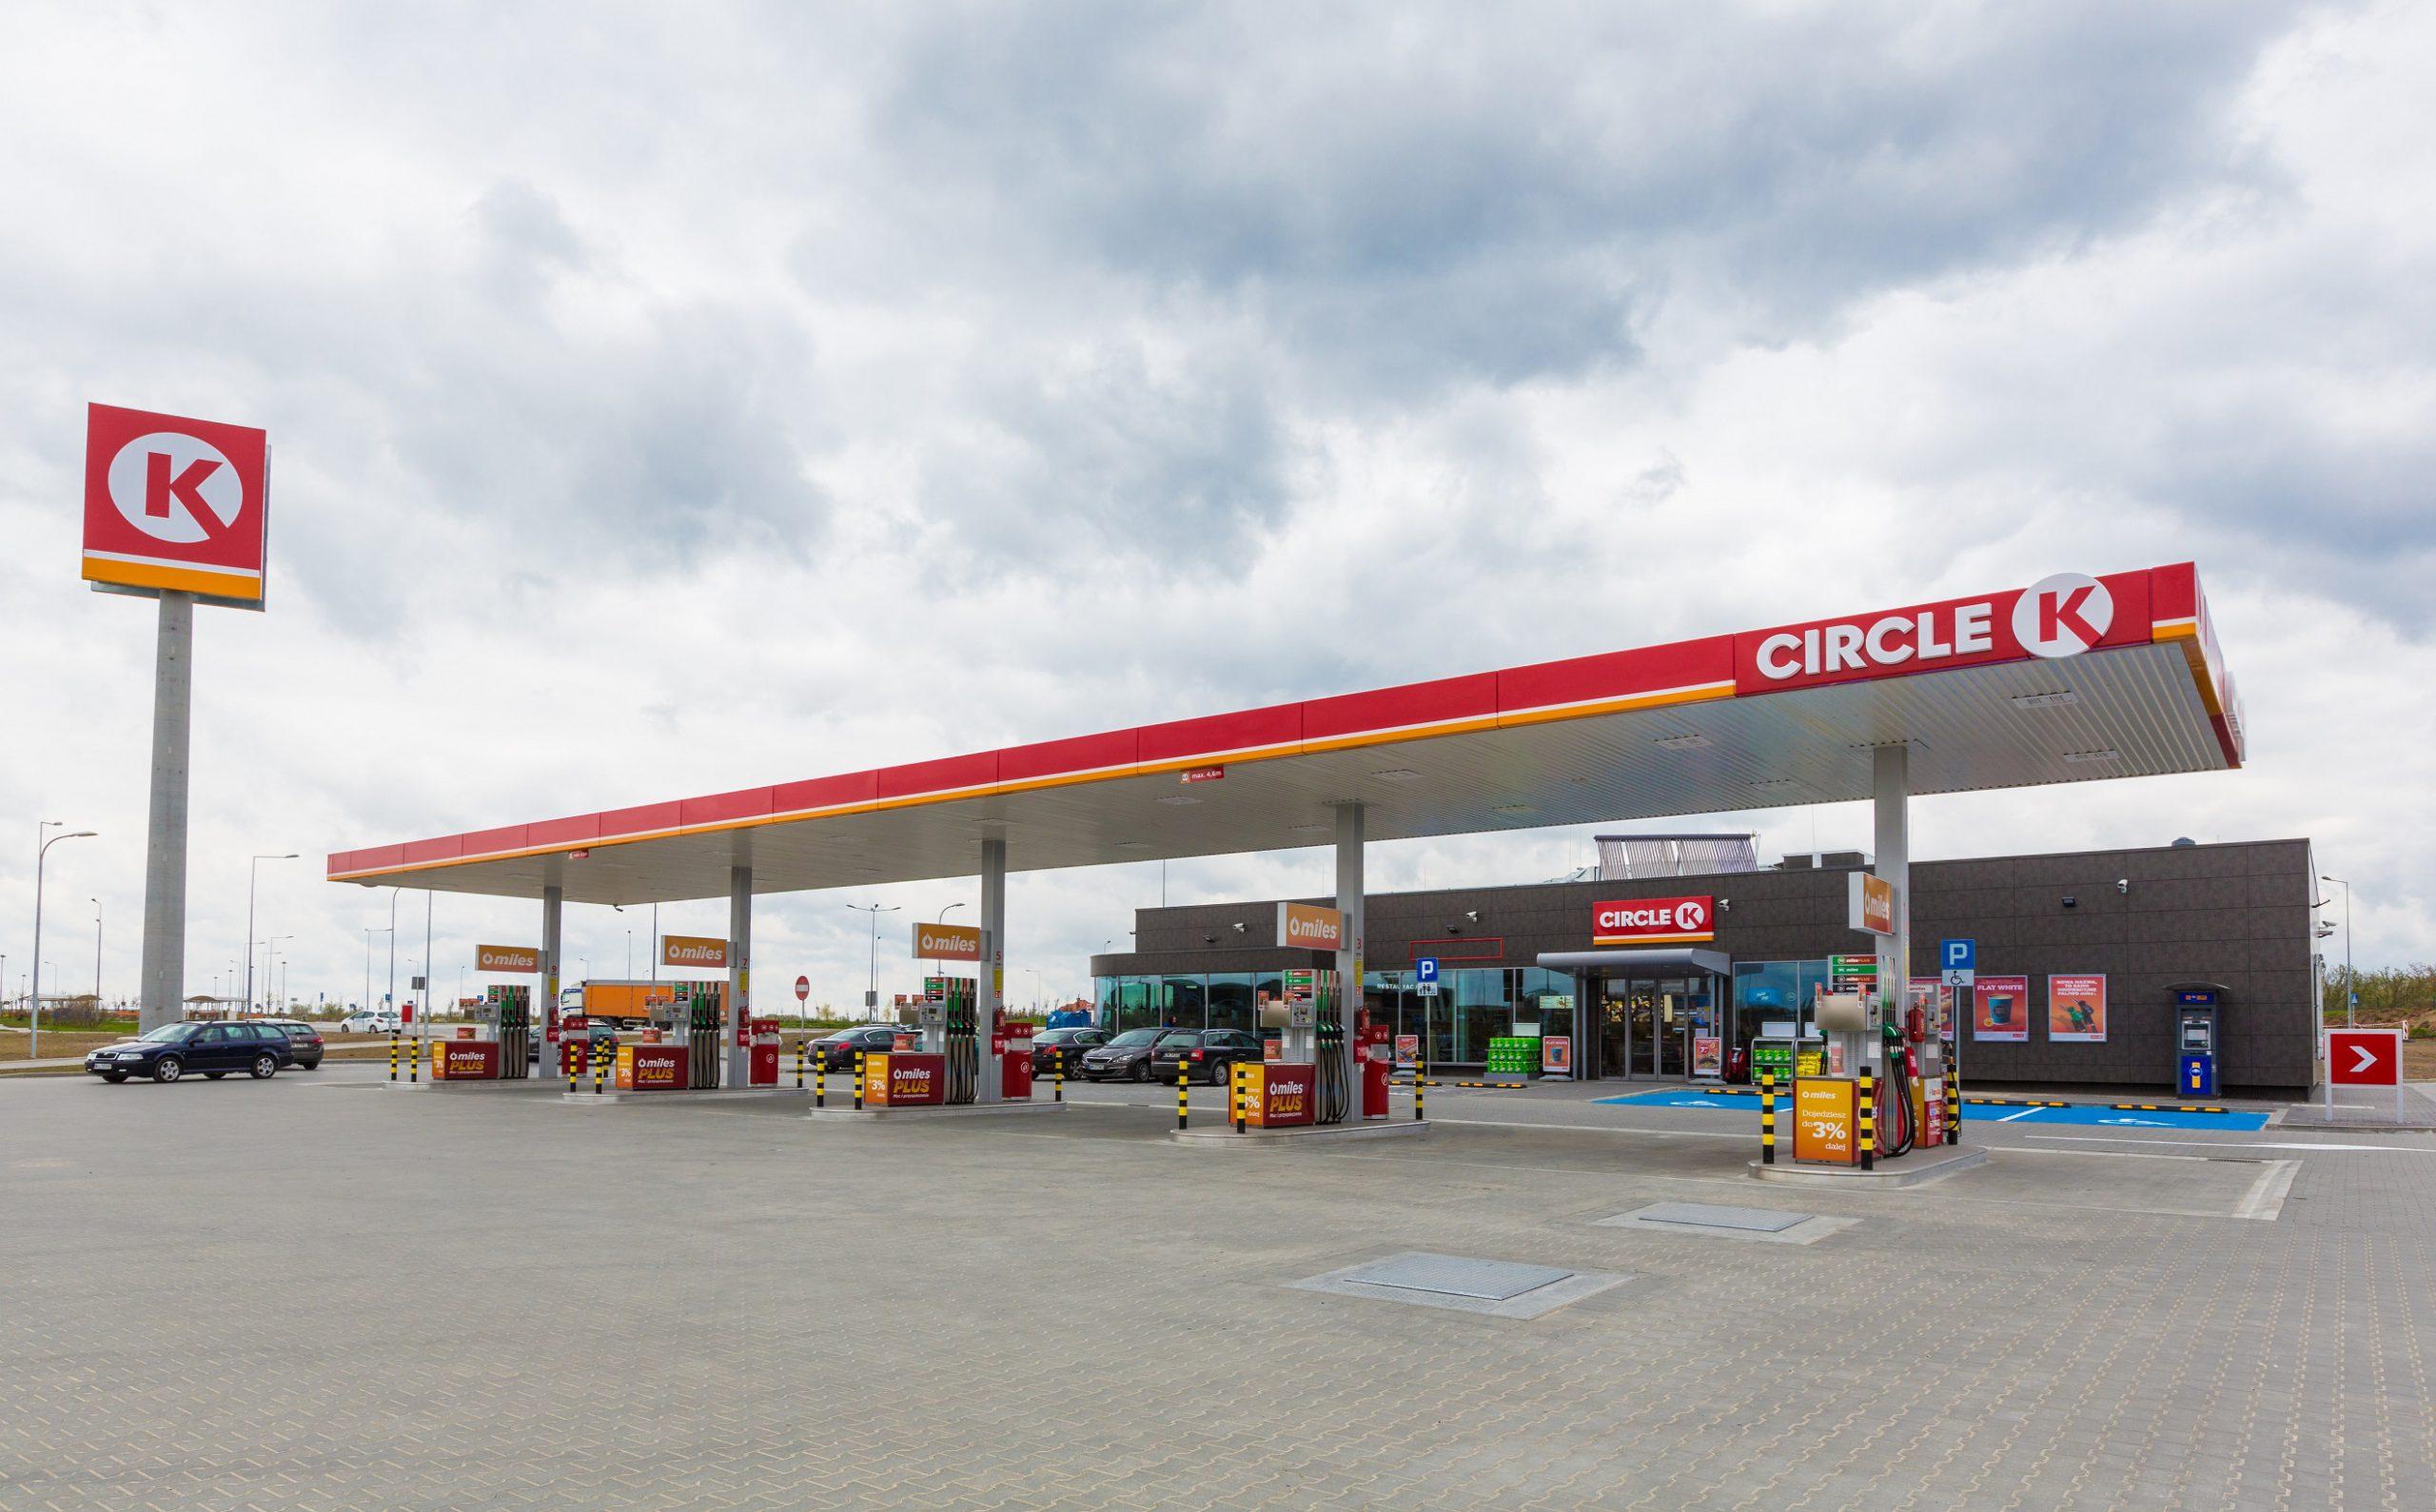 300 stacji Circle K – rebranding Statoil trwa